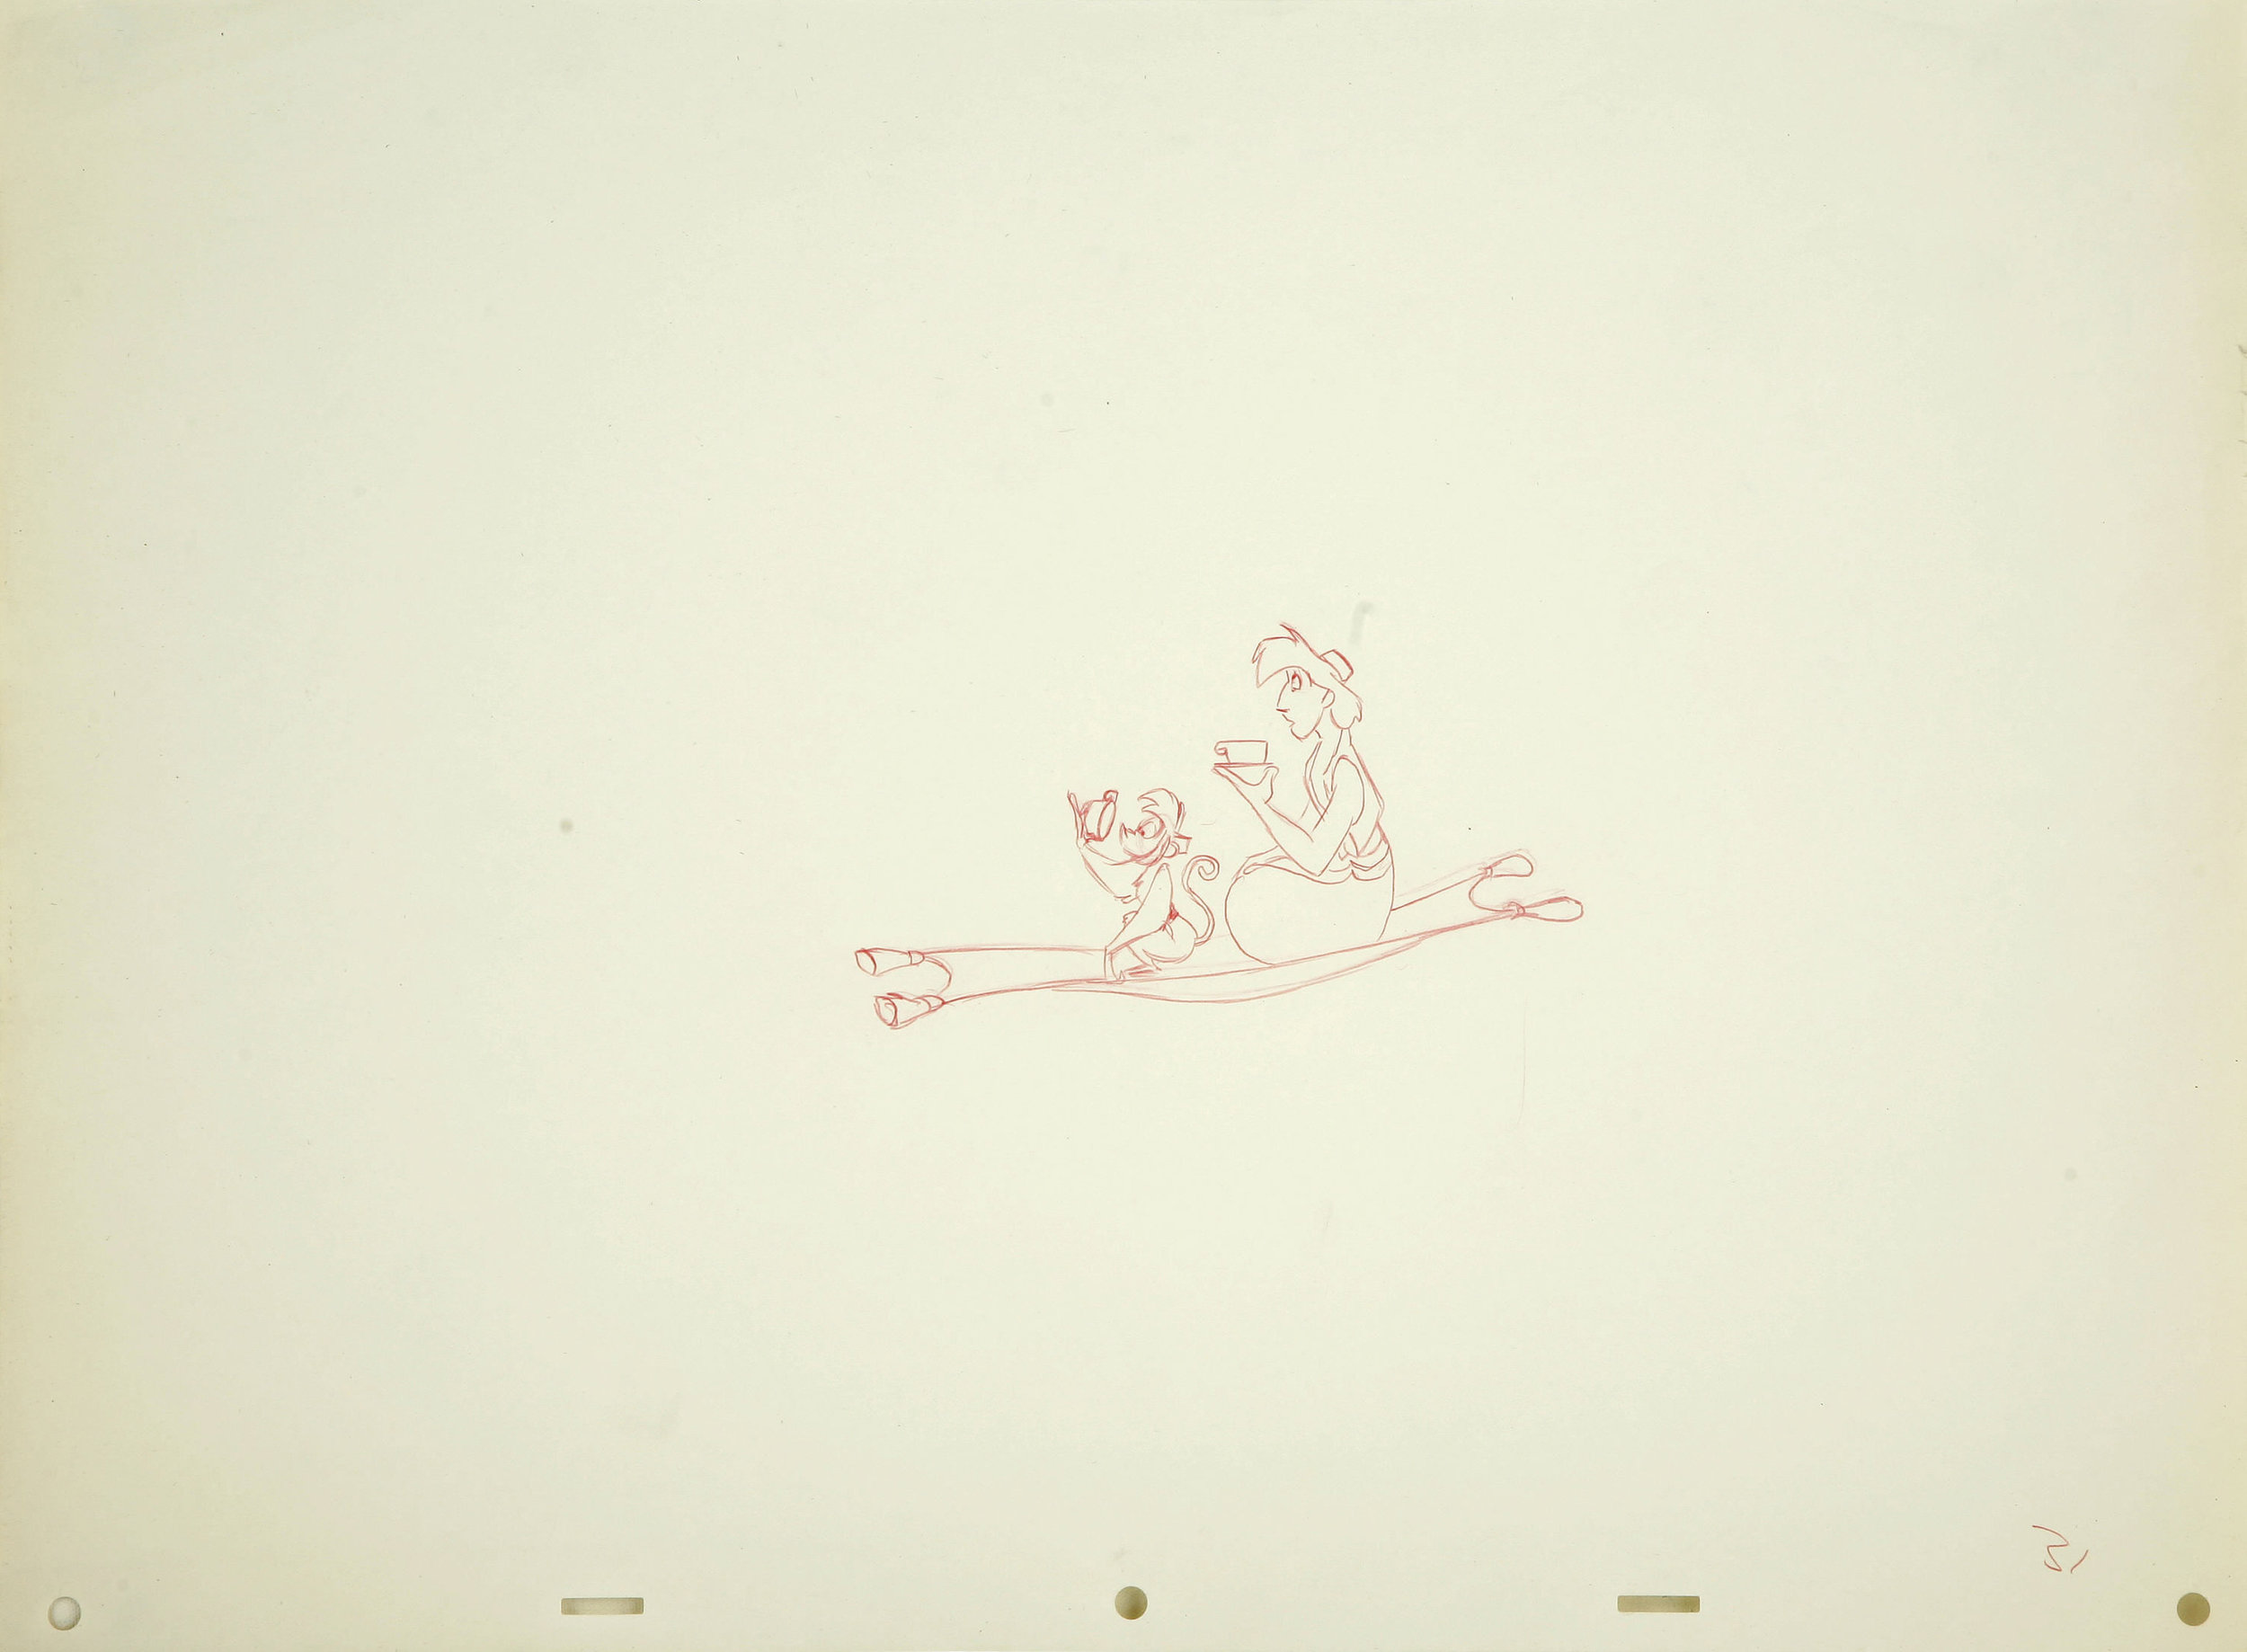 aladdin_disney_production_drawings_aladdin_44.jpg